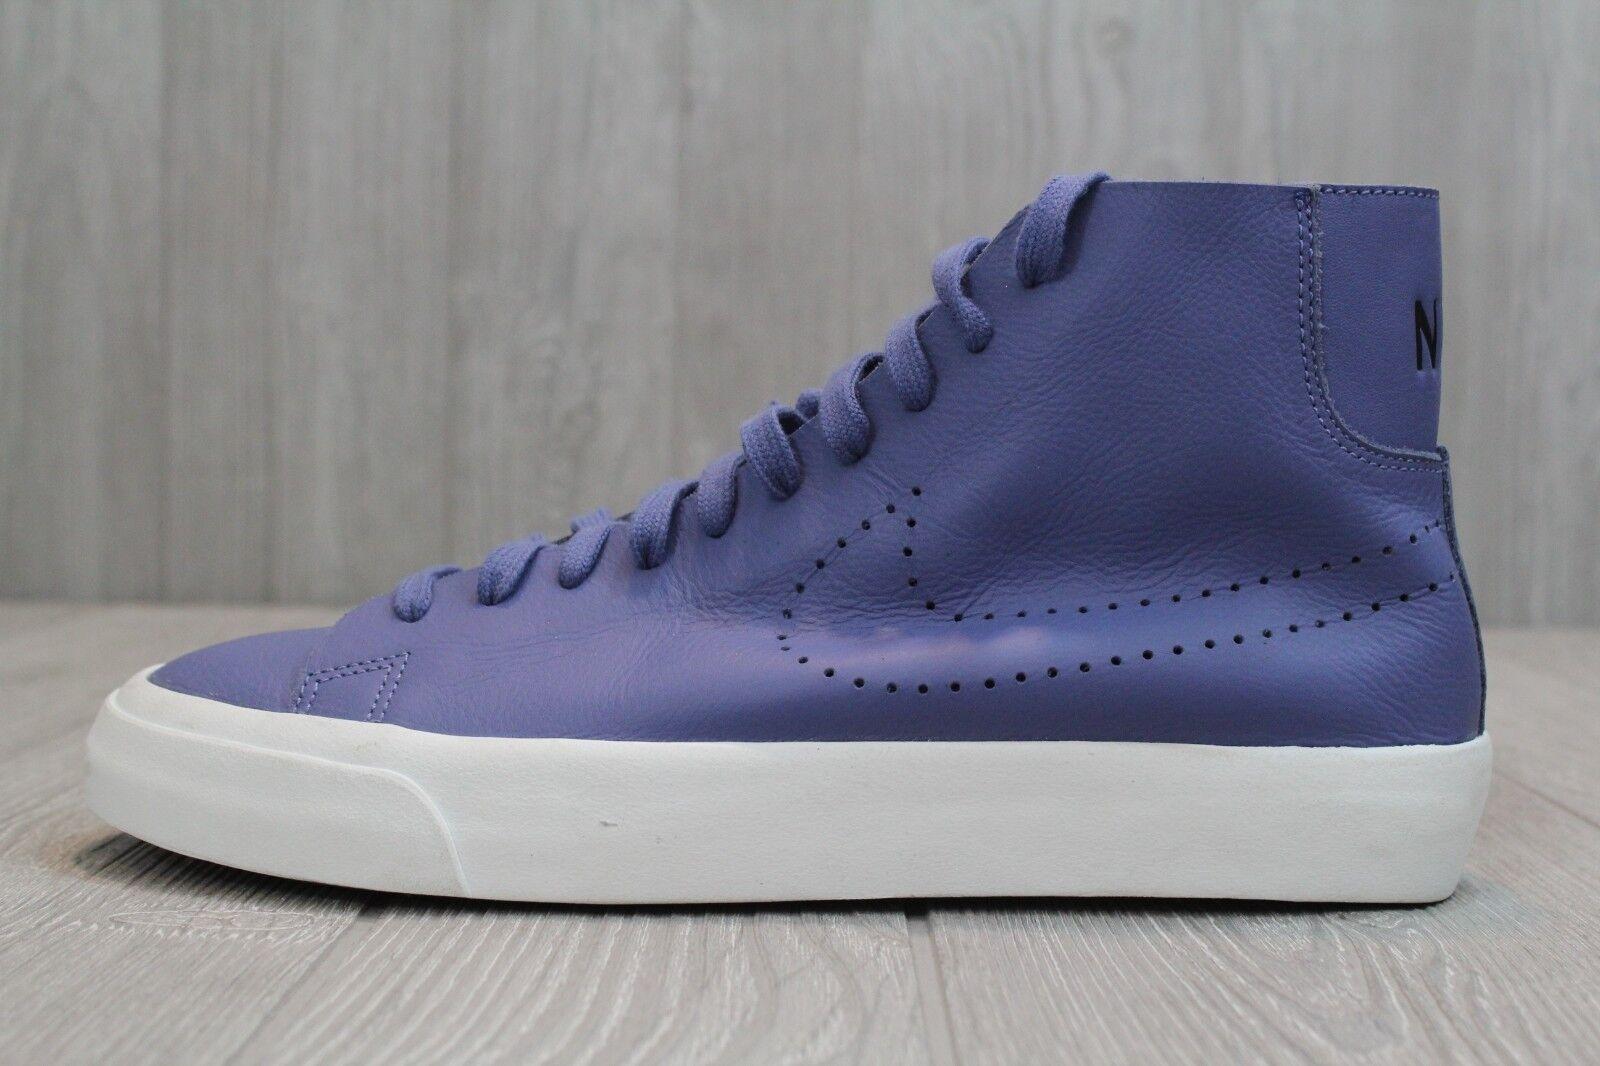 24 Nike Blazer Studio Italian Leather Men's shoes bluee Sz 9-11 880870 400  170